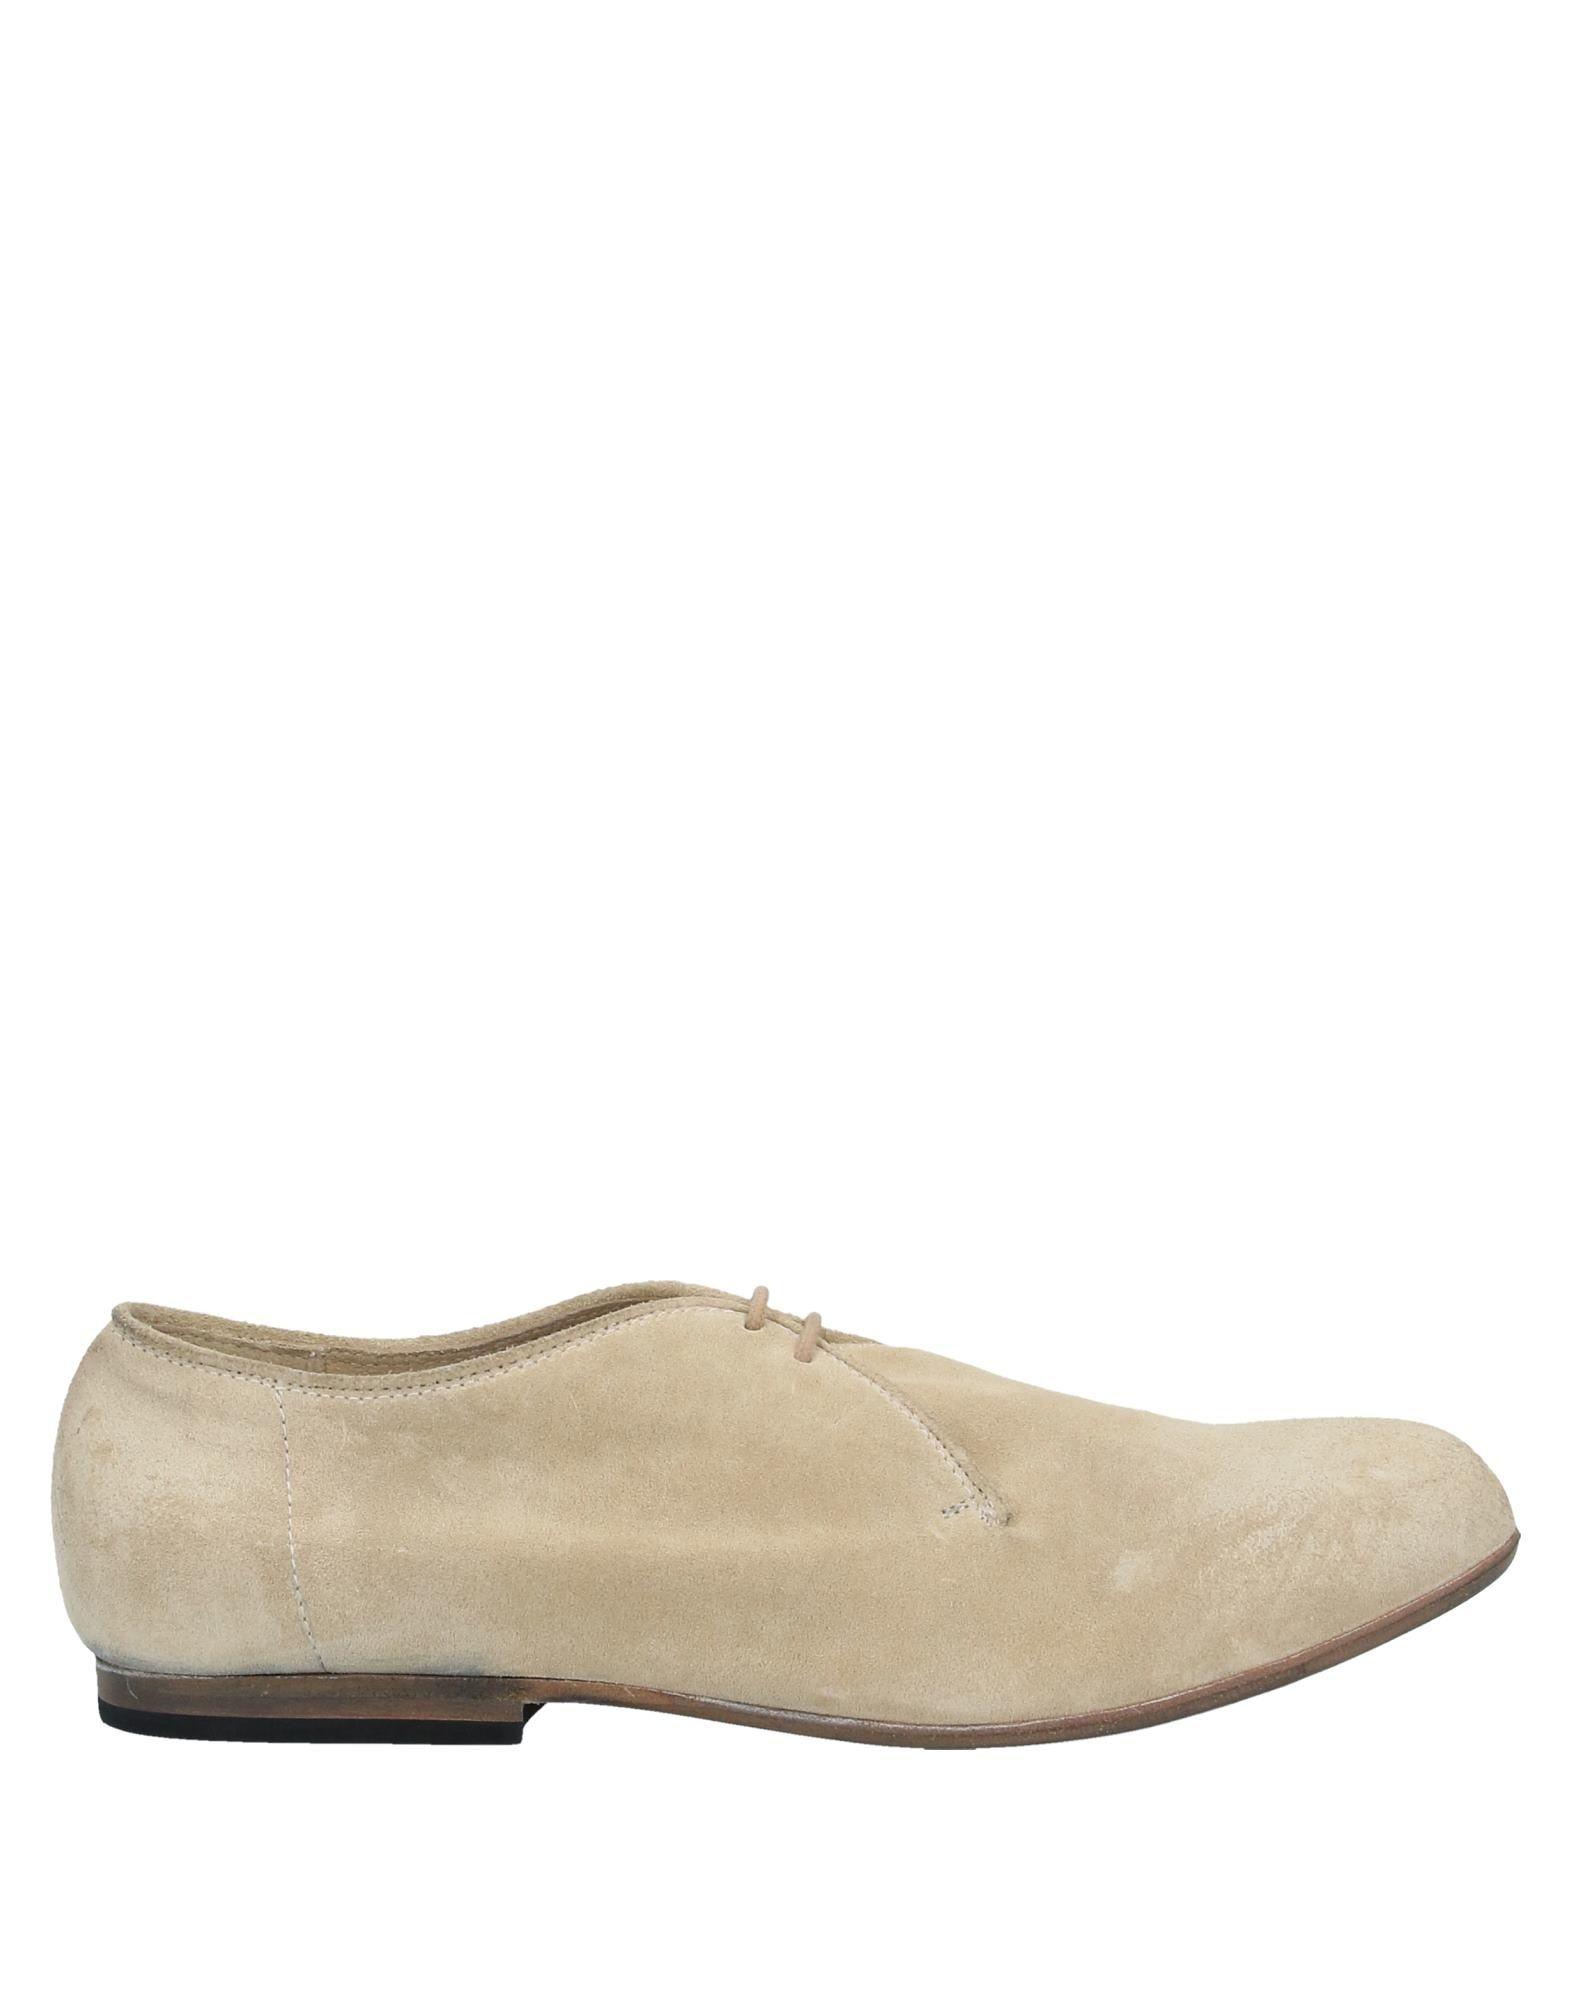 MASSIMO ALBA Обувь на шнурках